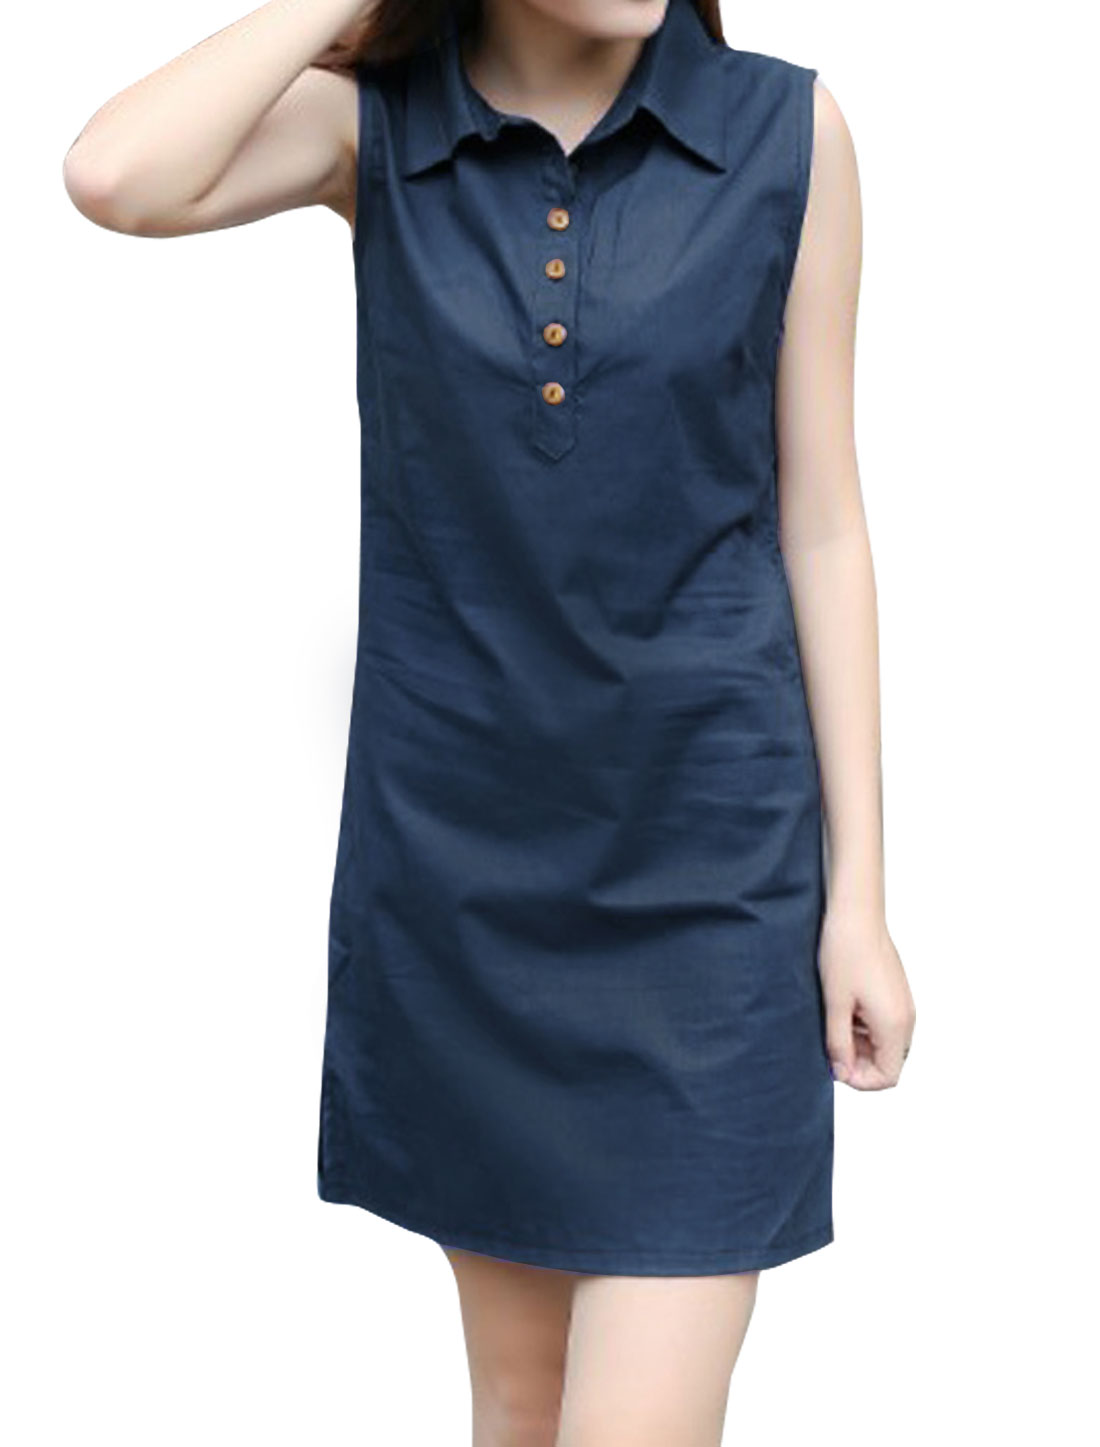 Woman Sleeveless Button Closed Upper Slim Fit Shirt Dress Blue S